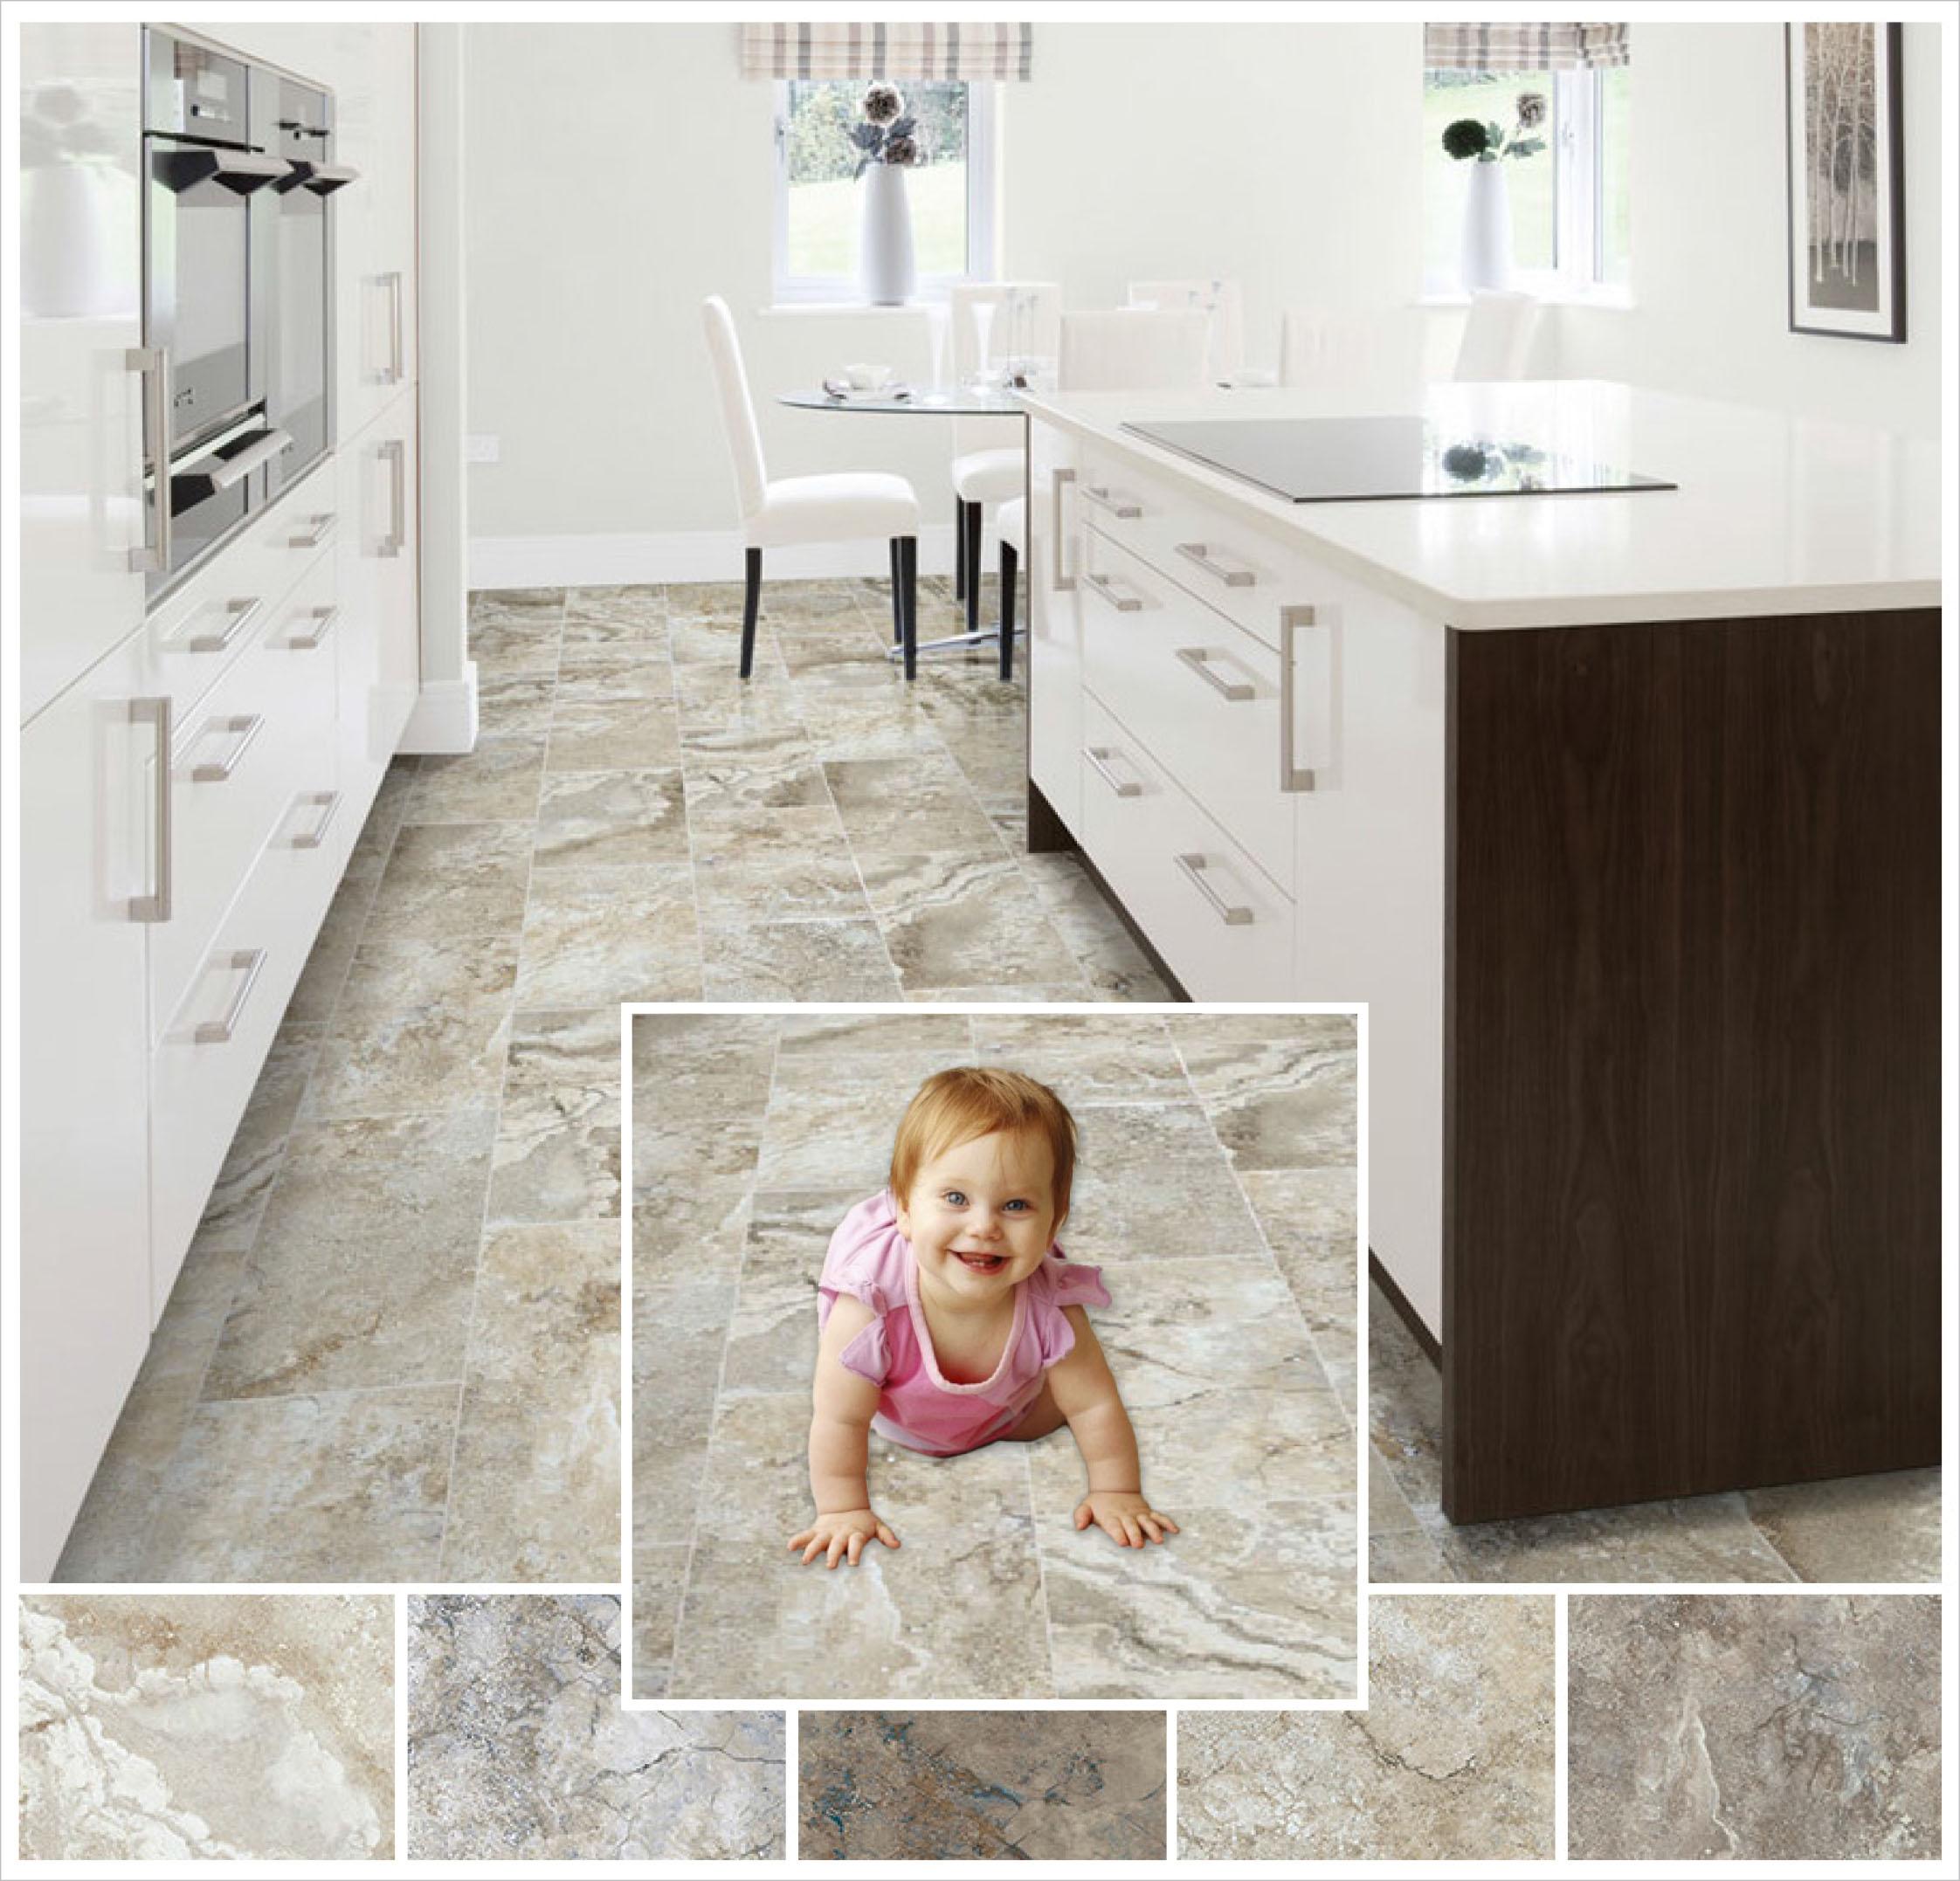 b full floor floors tiled porcelain decor size adorable interior ideas winsome bathroom of tile cute ceramic flooring porcelin